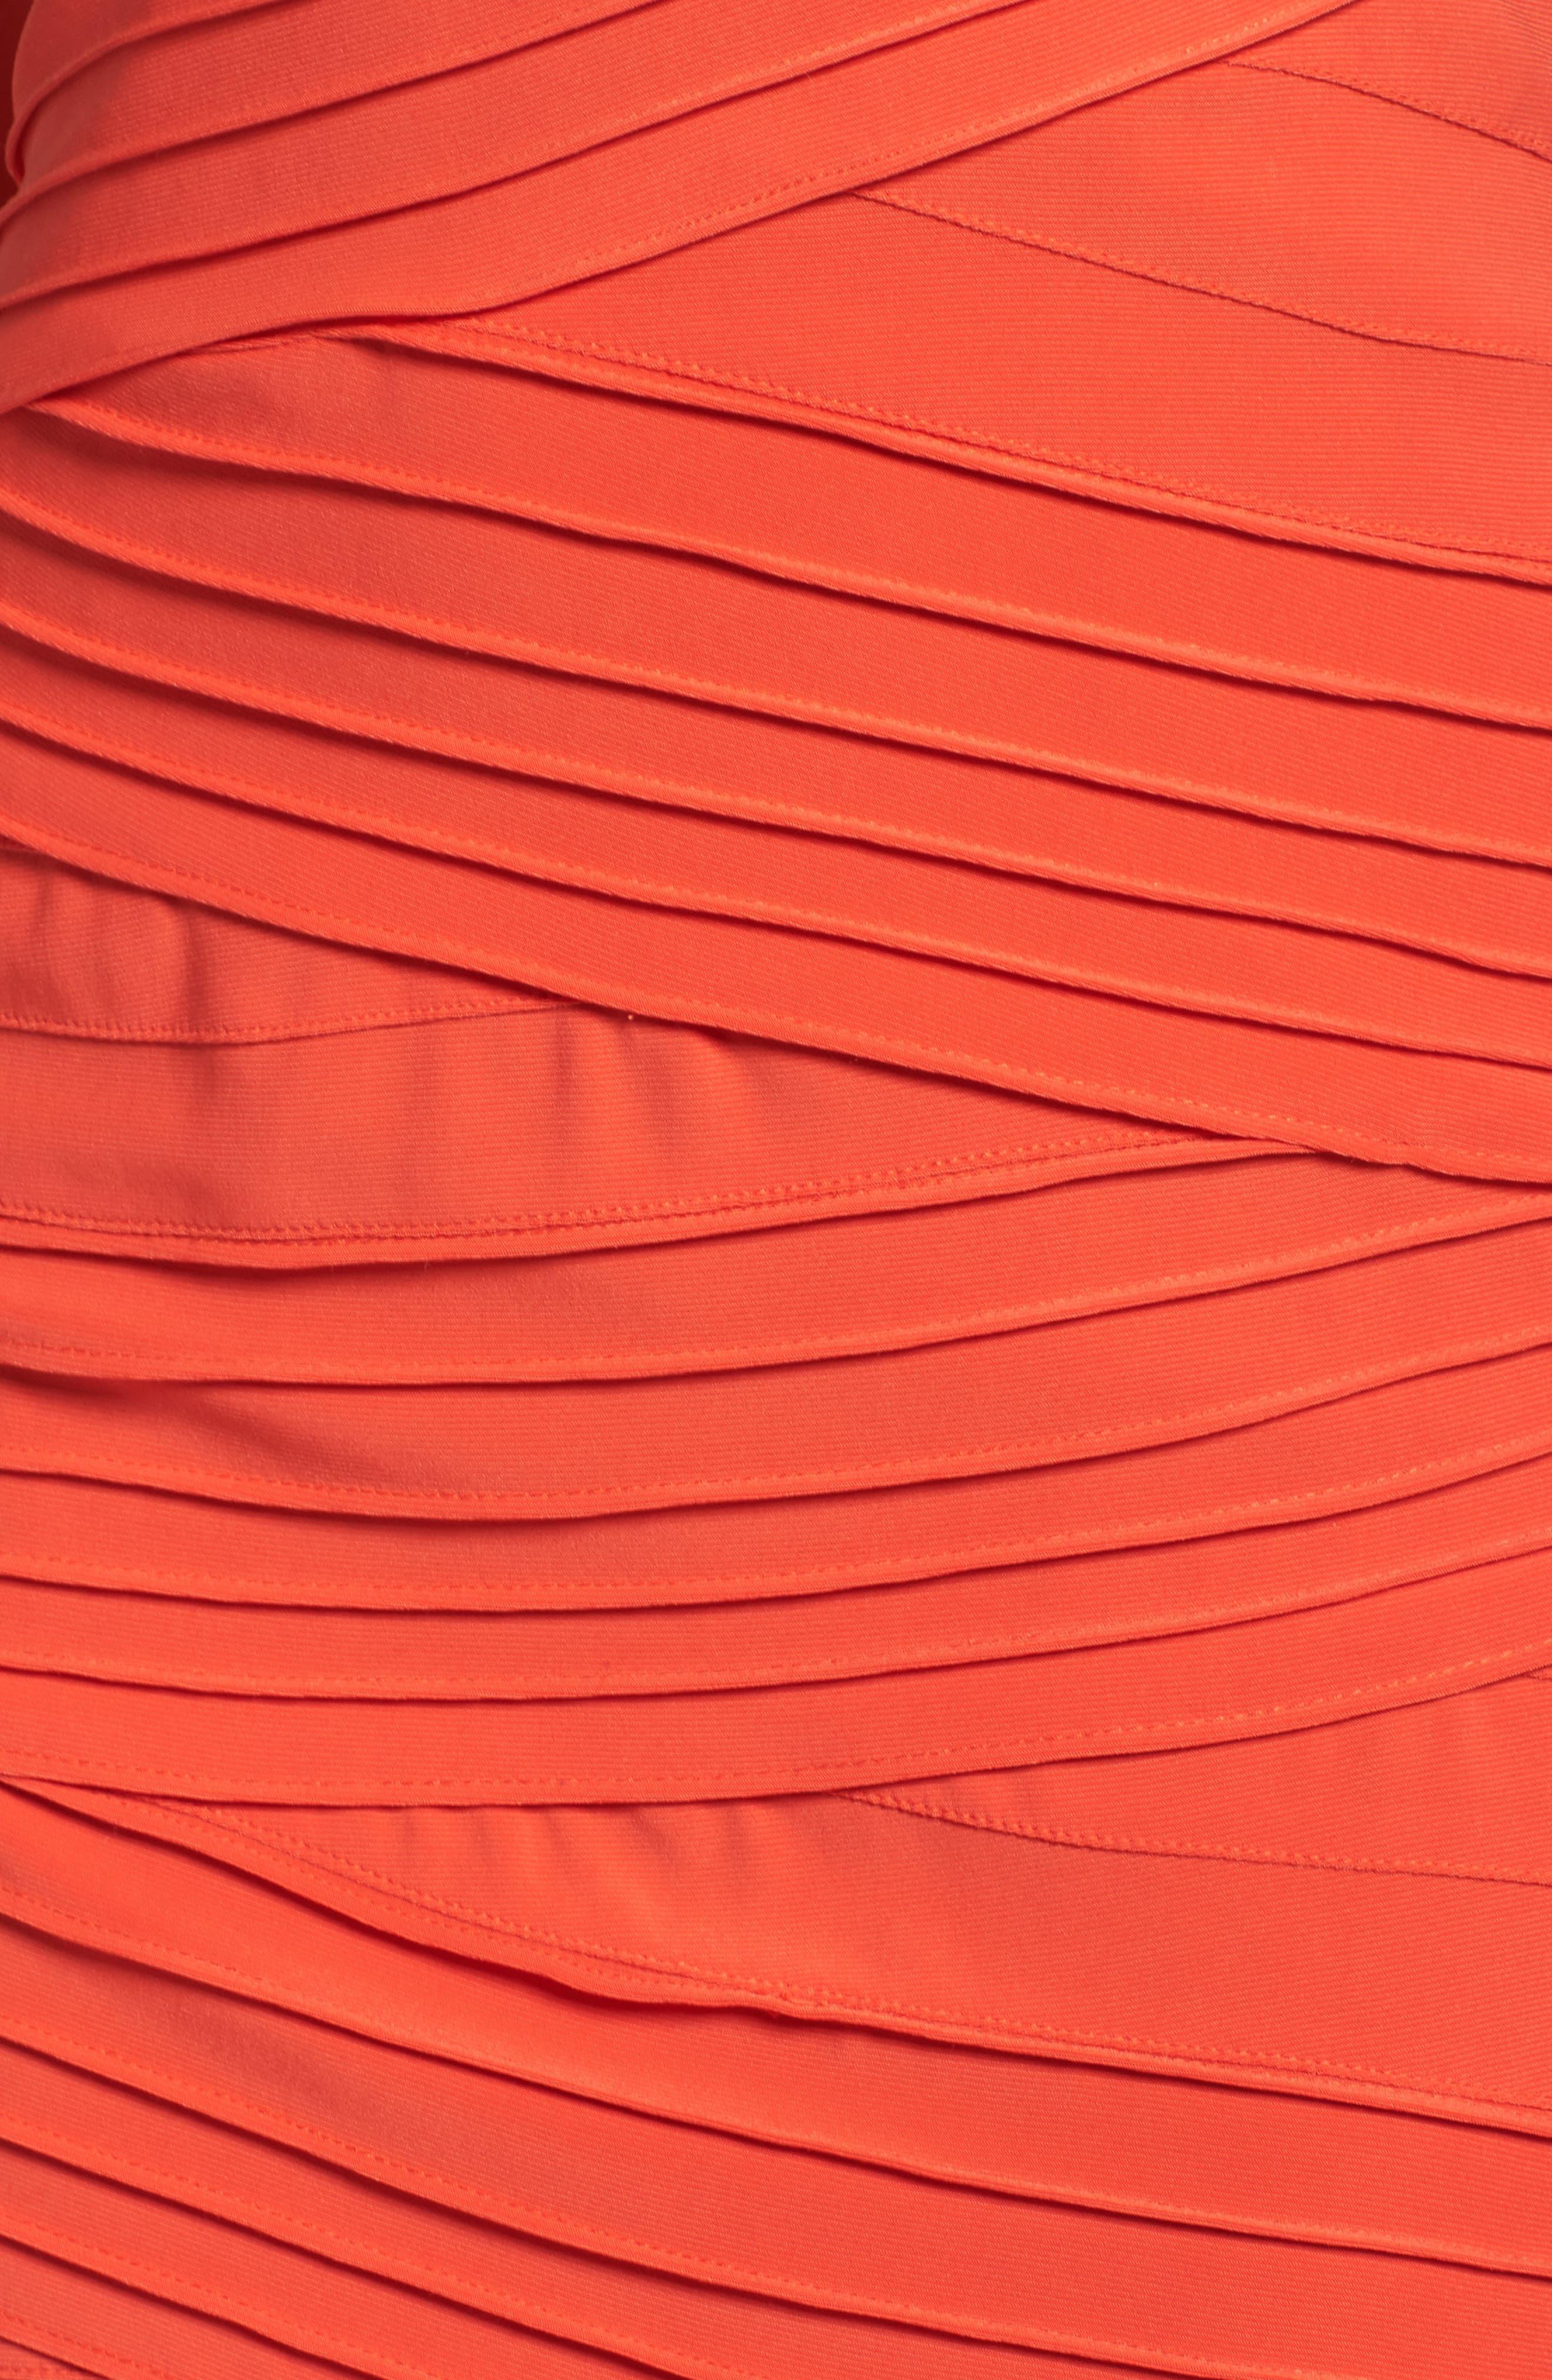 Banded Body-Con Dress,                             Alternate thumbnail 5, color,                             Fire Orange